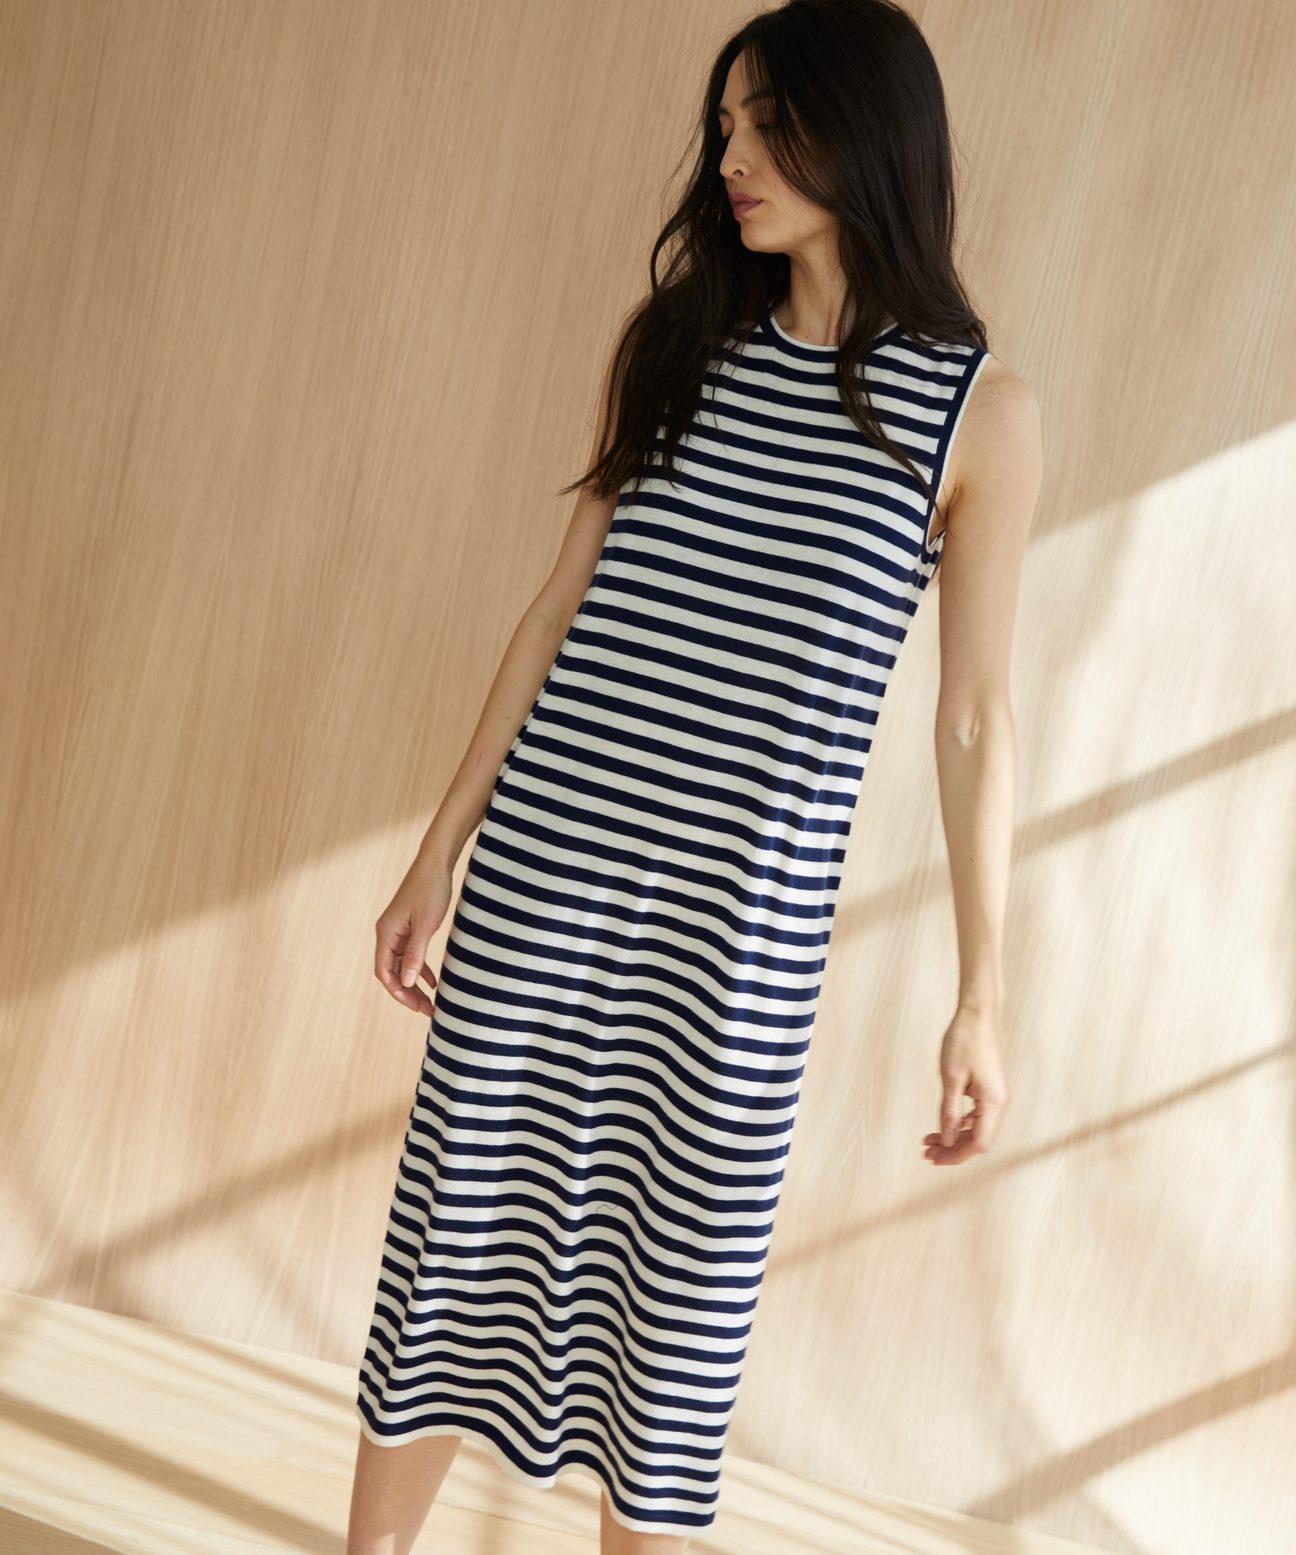 Striped Merino Tank Dress Navy White Jenni Kayne